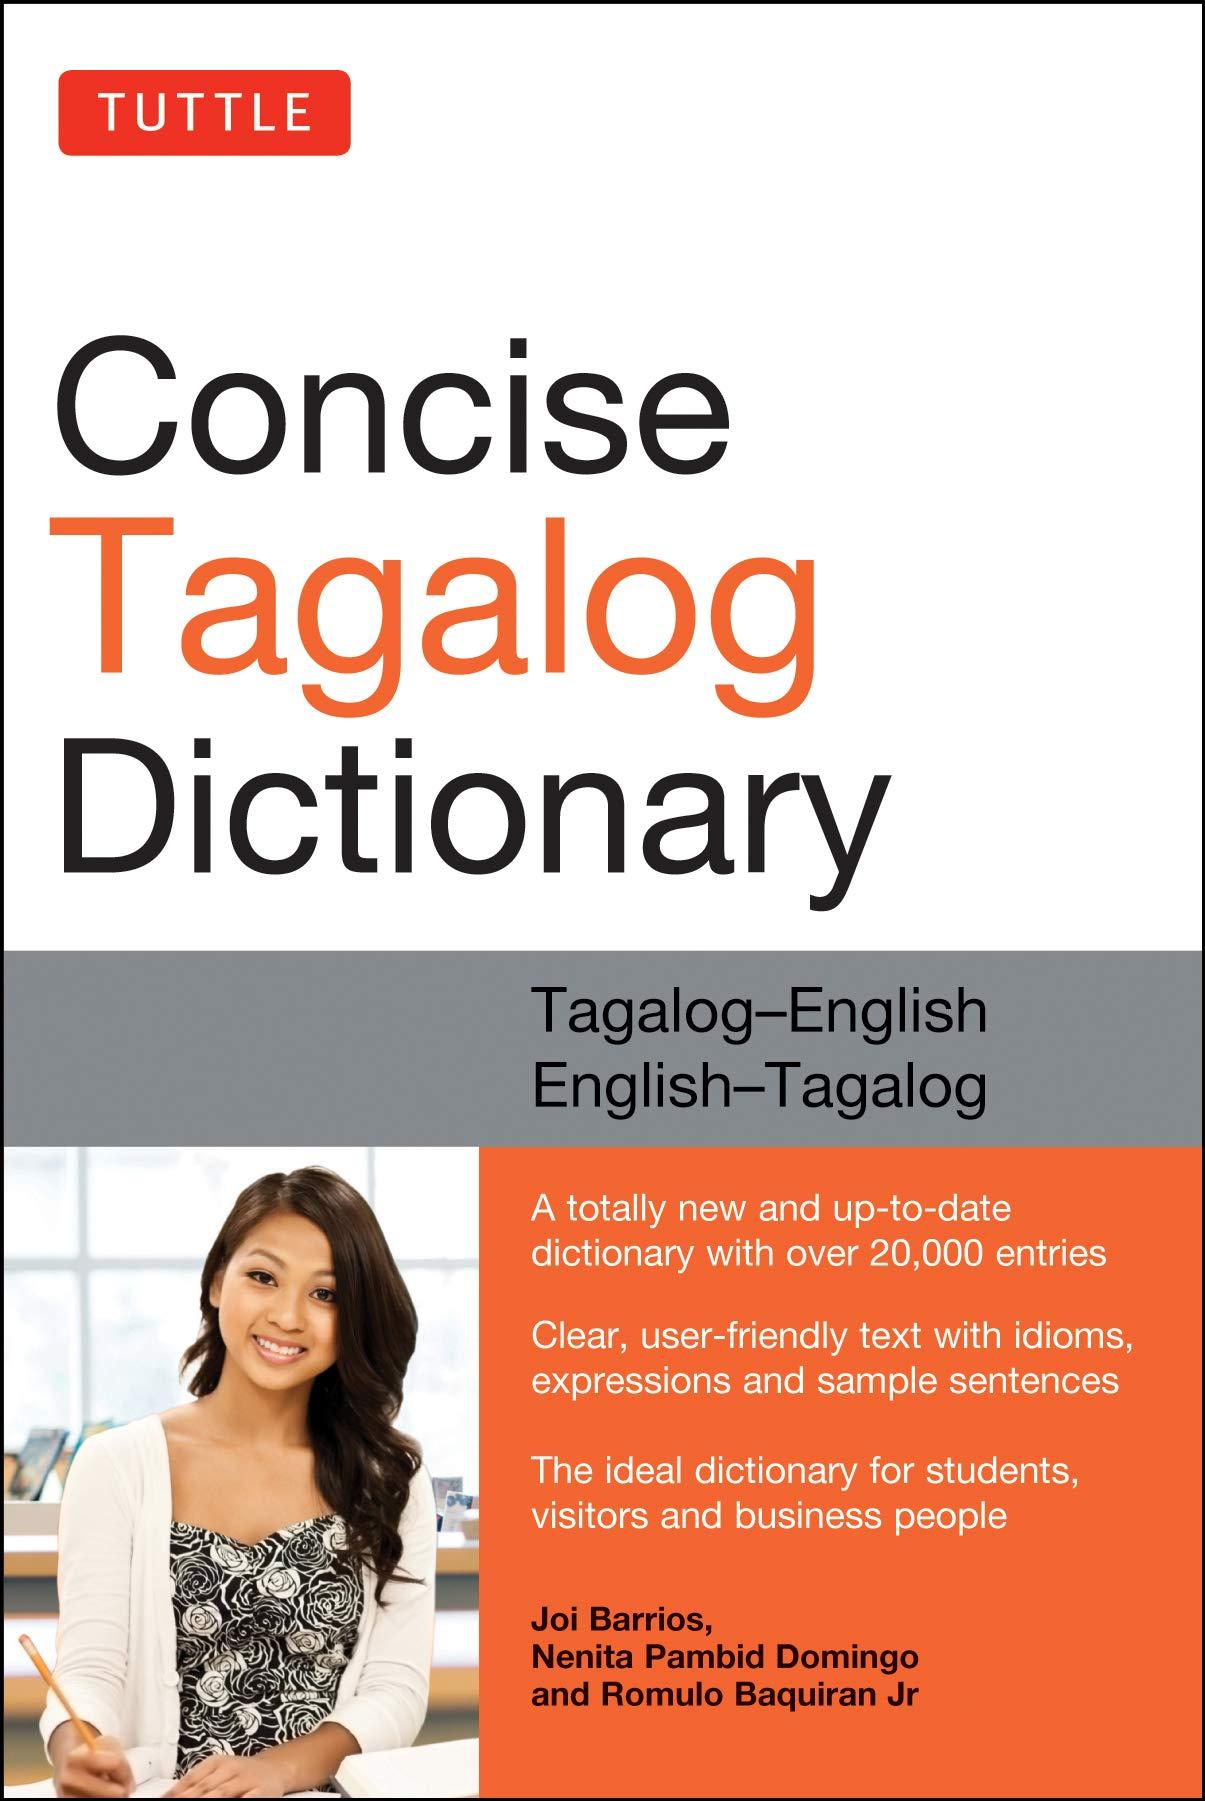 Amazon.com Tuttle Concise Tagalog Dictionary Tagalog English ...